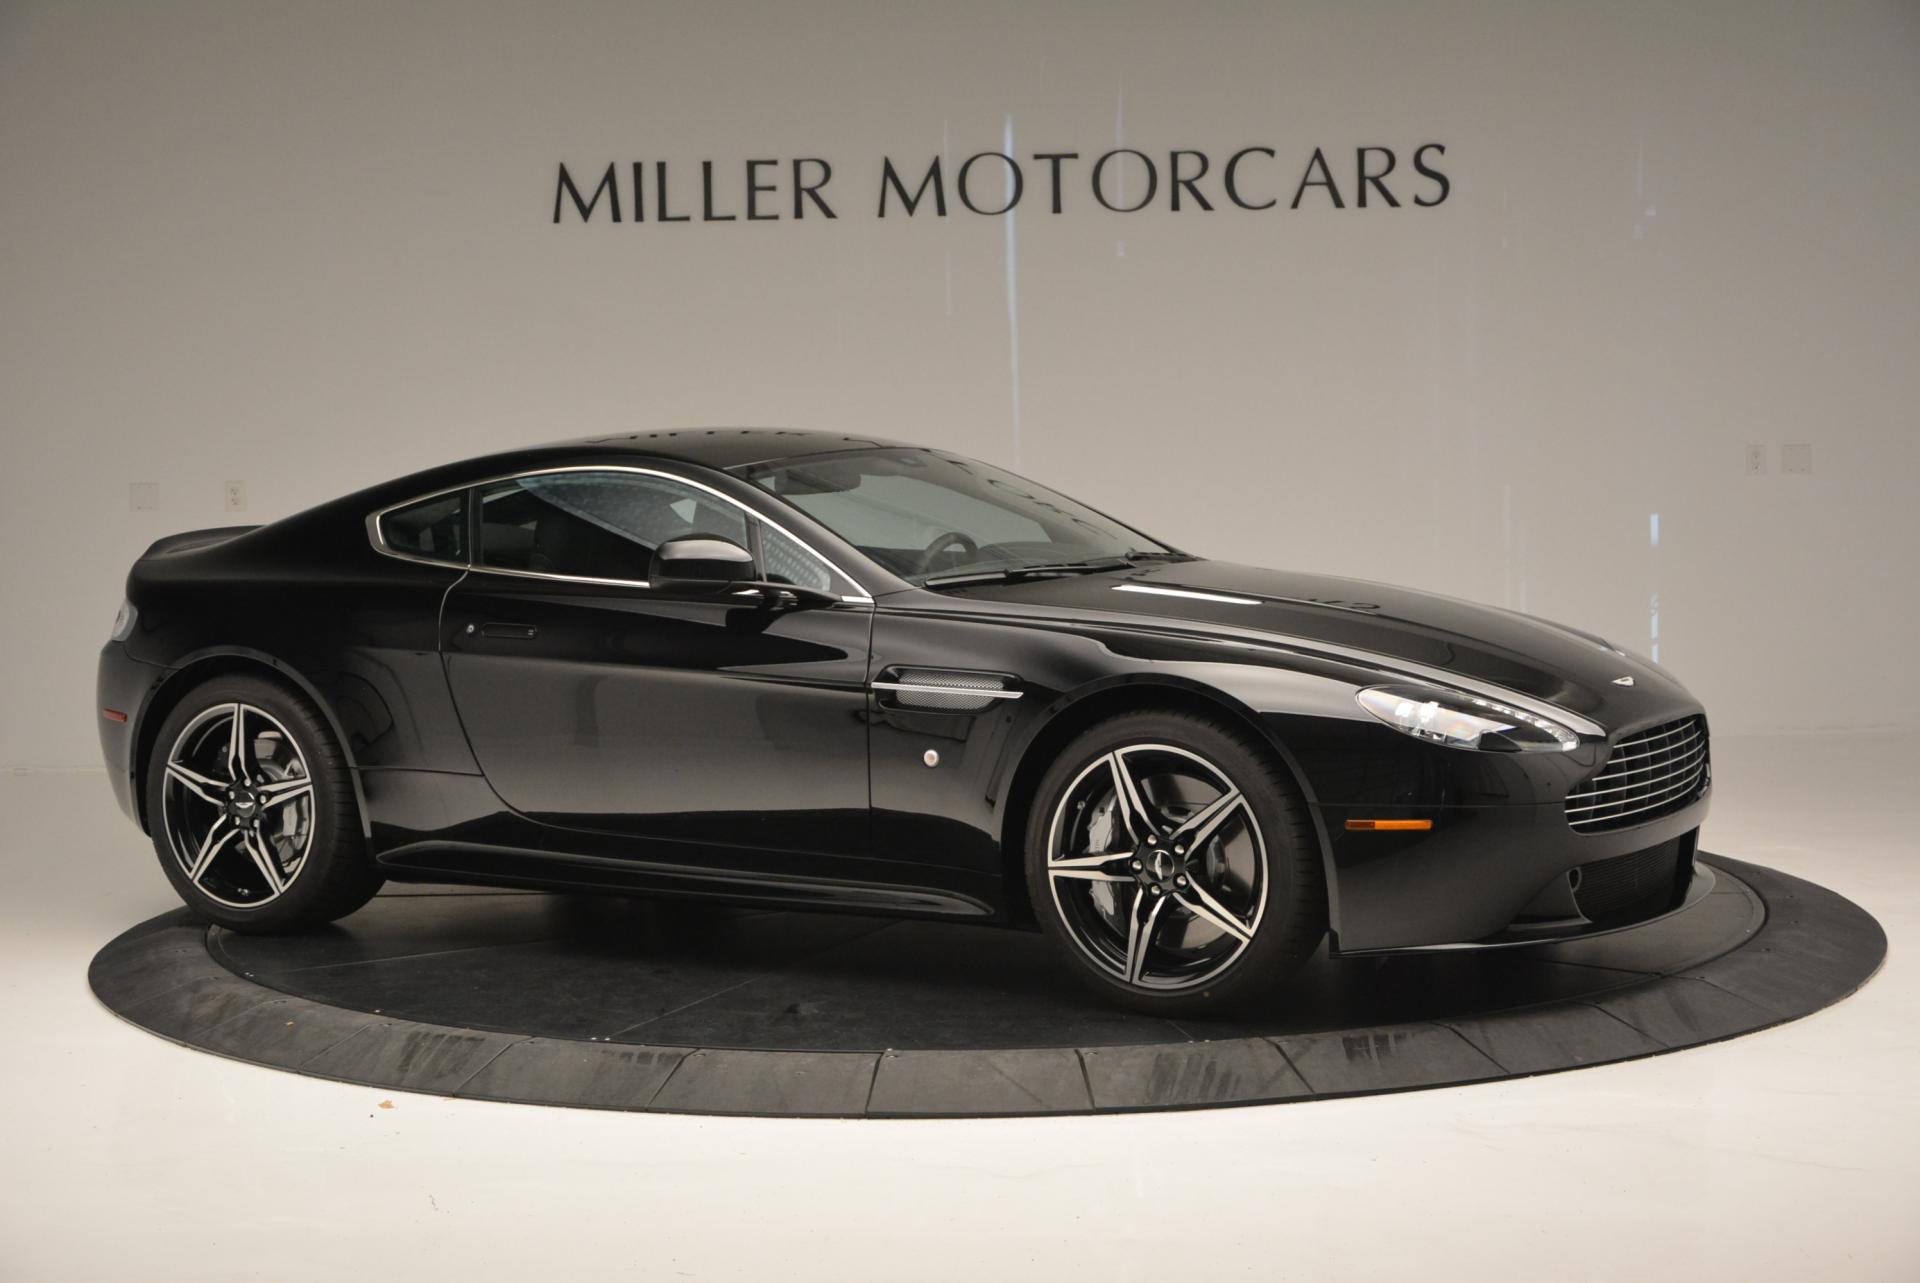 New 2016 Aston Martin V8 Vantage GTS S For Sale In Westport, CT 526_p8